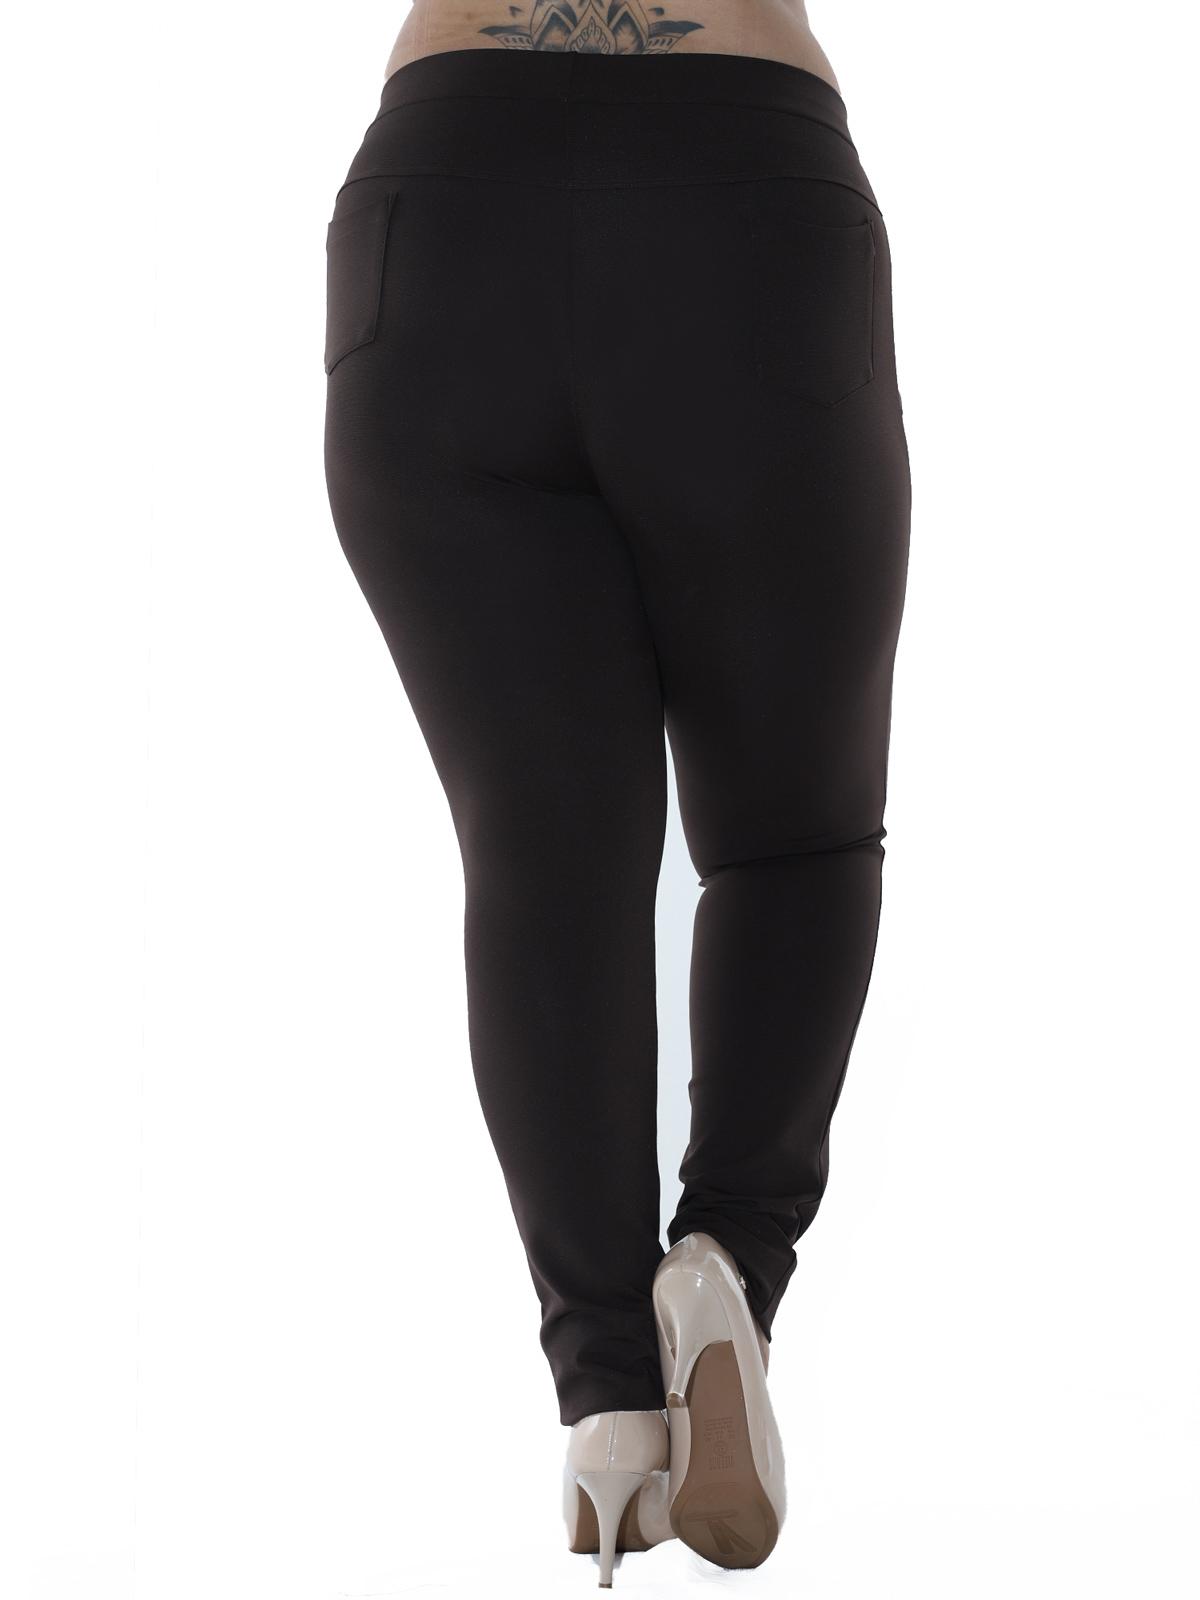 Calça Plus Size Feminina Body Fit Grossa Recortes Marrom